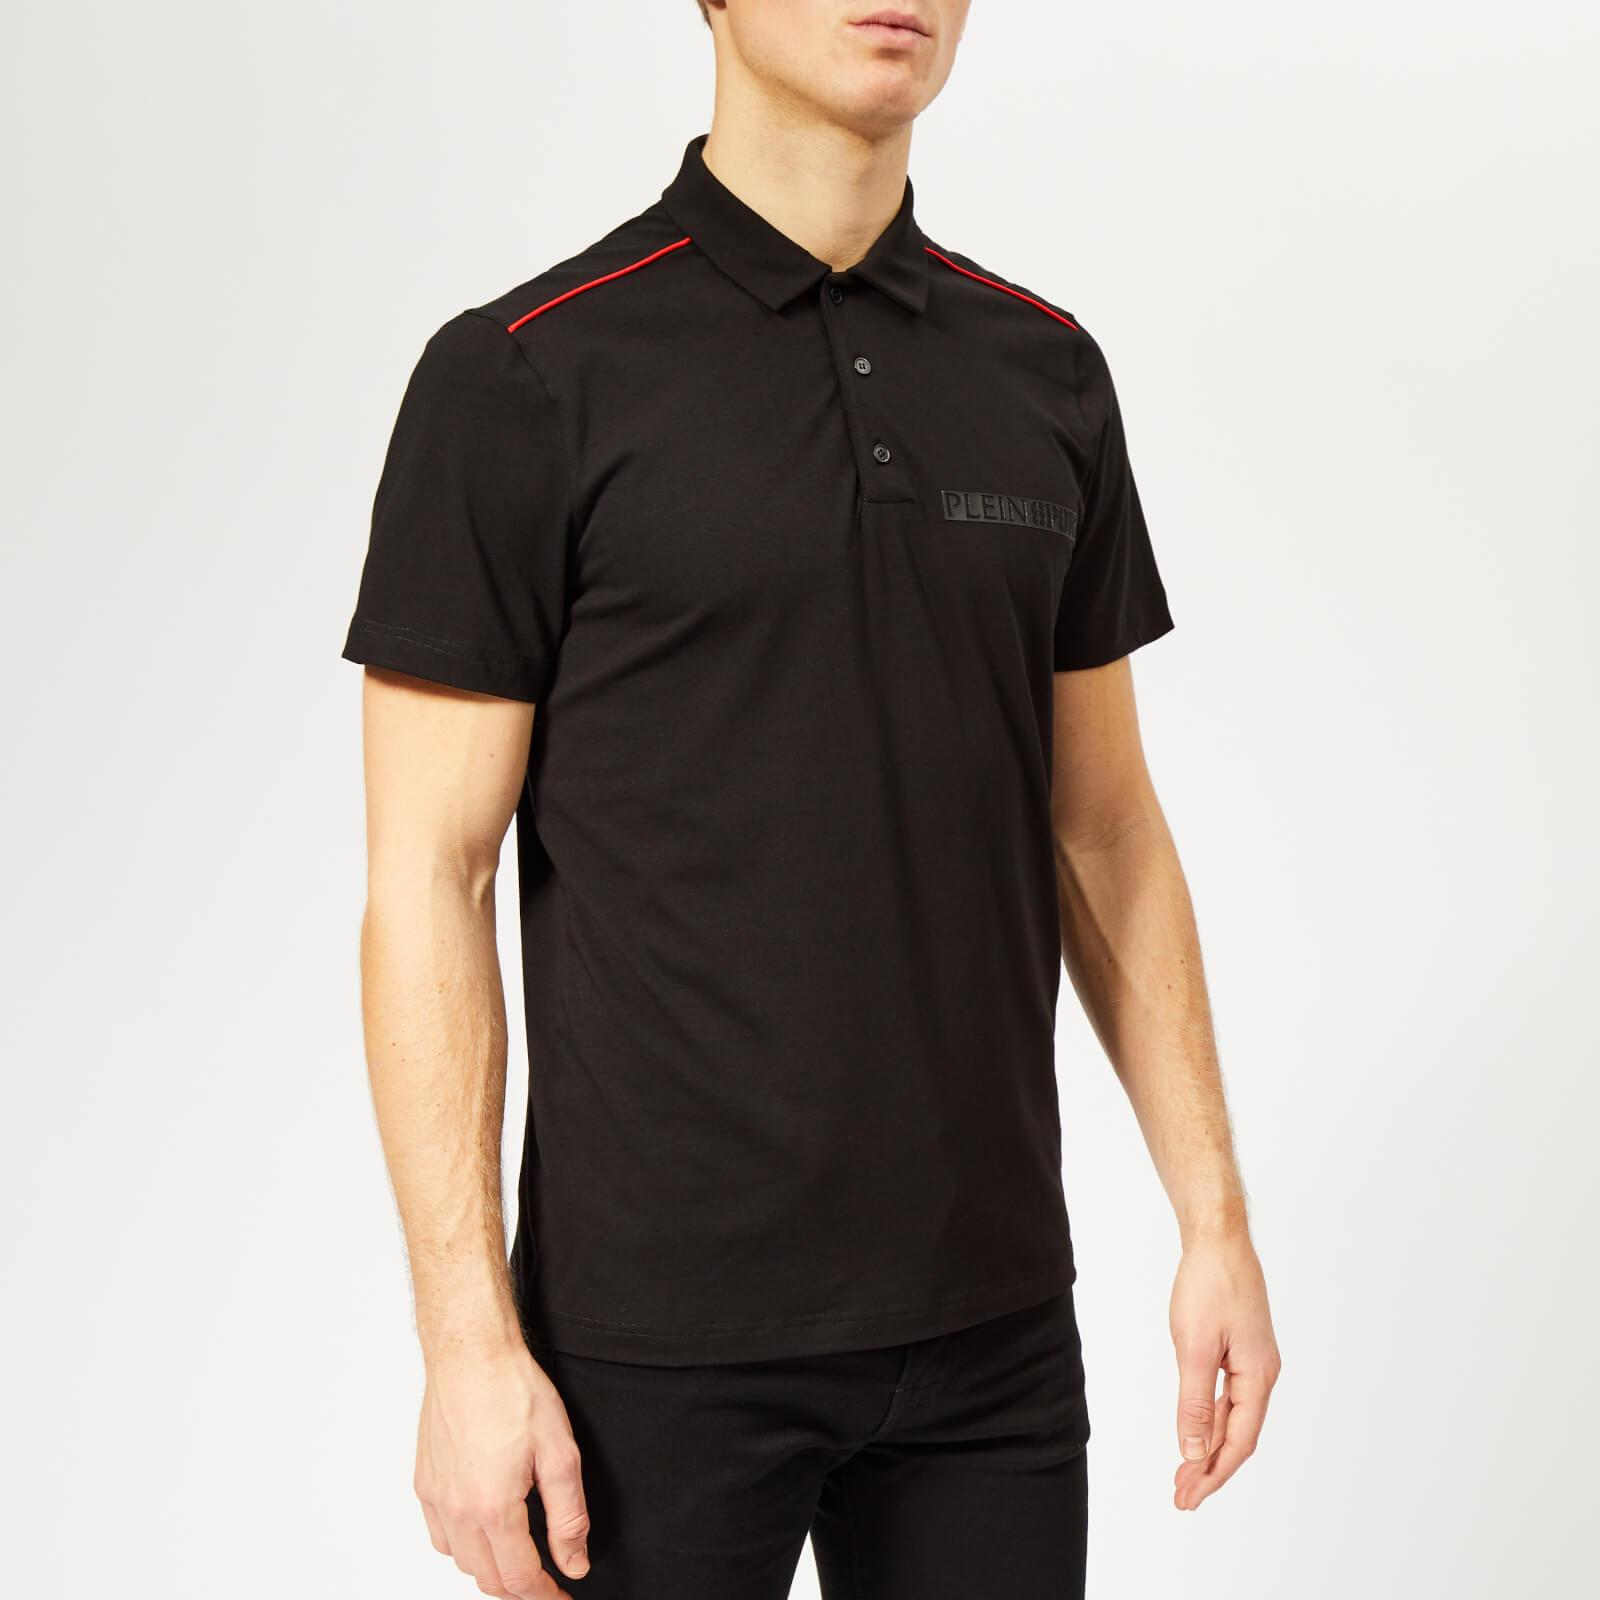 Plein Sport Men's Statement Polo Shirt - Black - S - Black